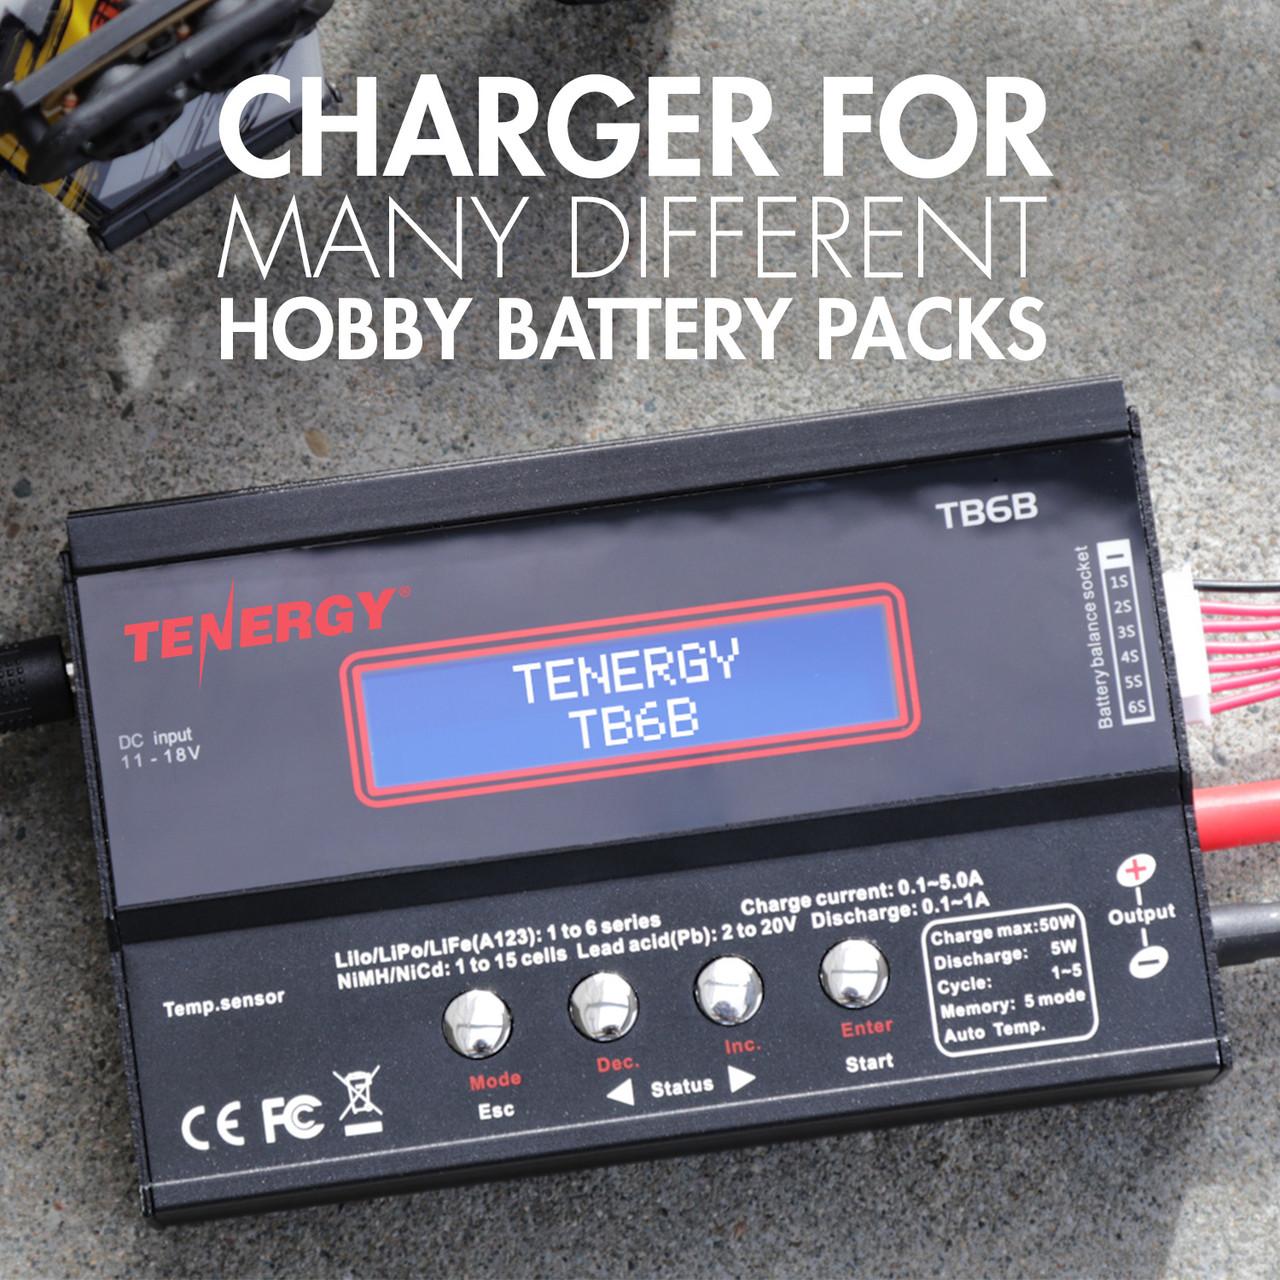 Tenergy TB6B Multifunctional Balance Charger for NiMH/NiCd/LiPo/Li-Fe Battery Packs + Power Supply